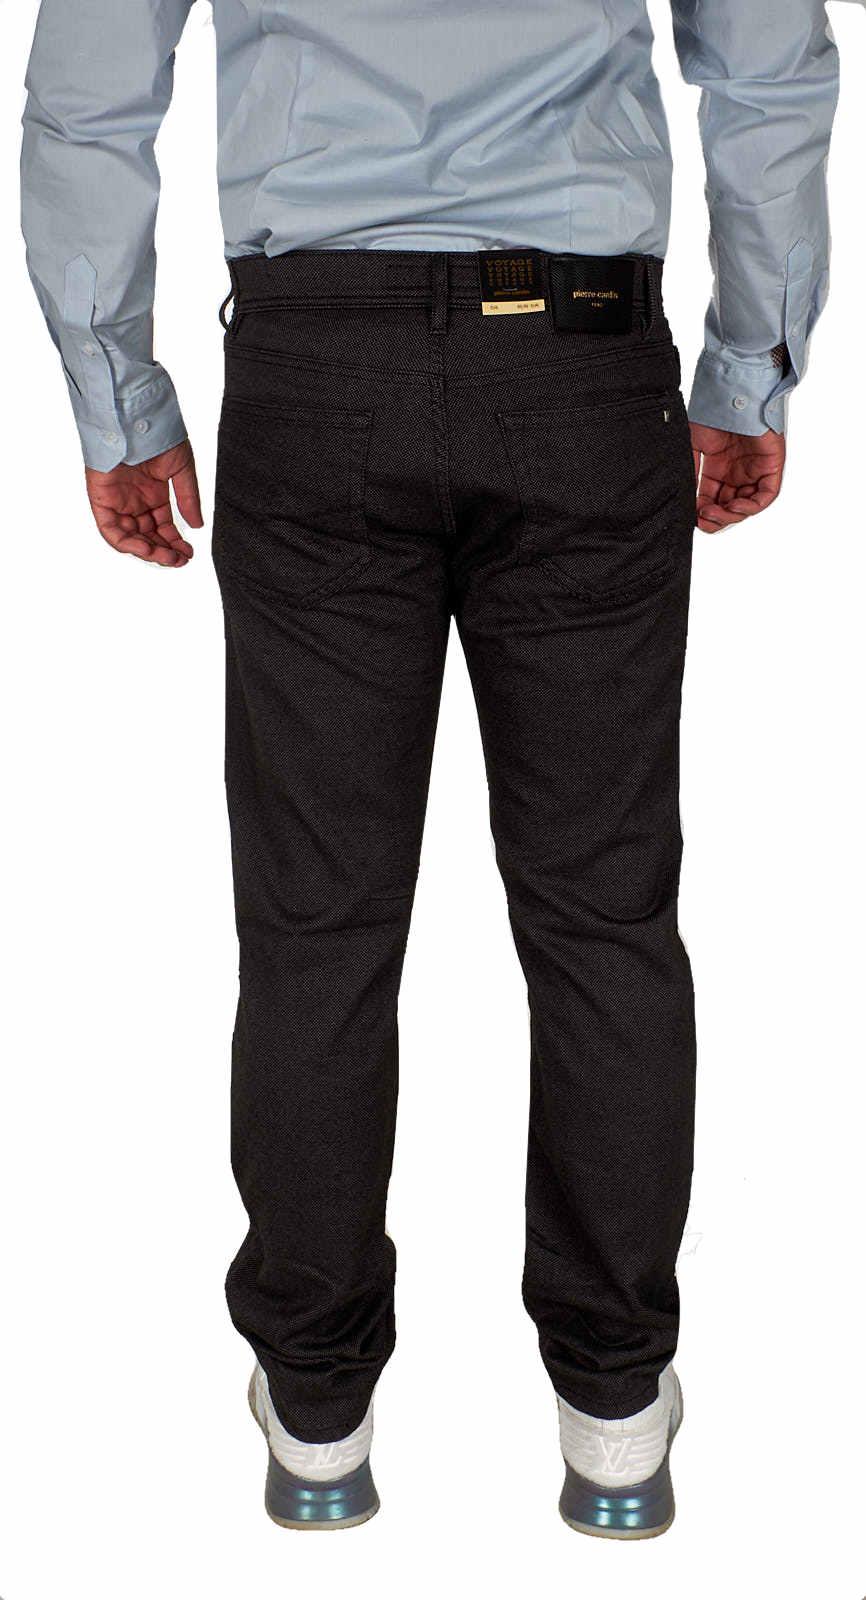 Pierre-Cardin-Jeans-Herren-Hose-Lyon-Chino-Modern-Fit-Slim-Leg-30917-4731-85 Indexbild 4